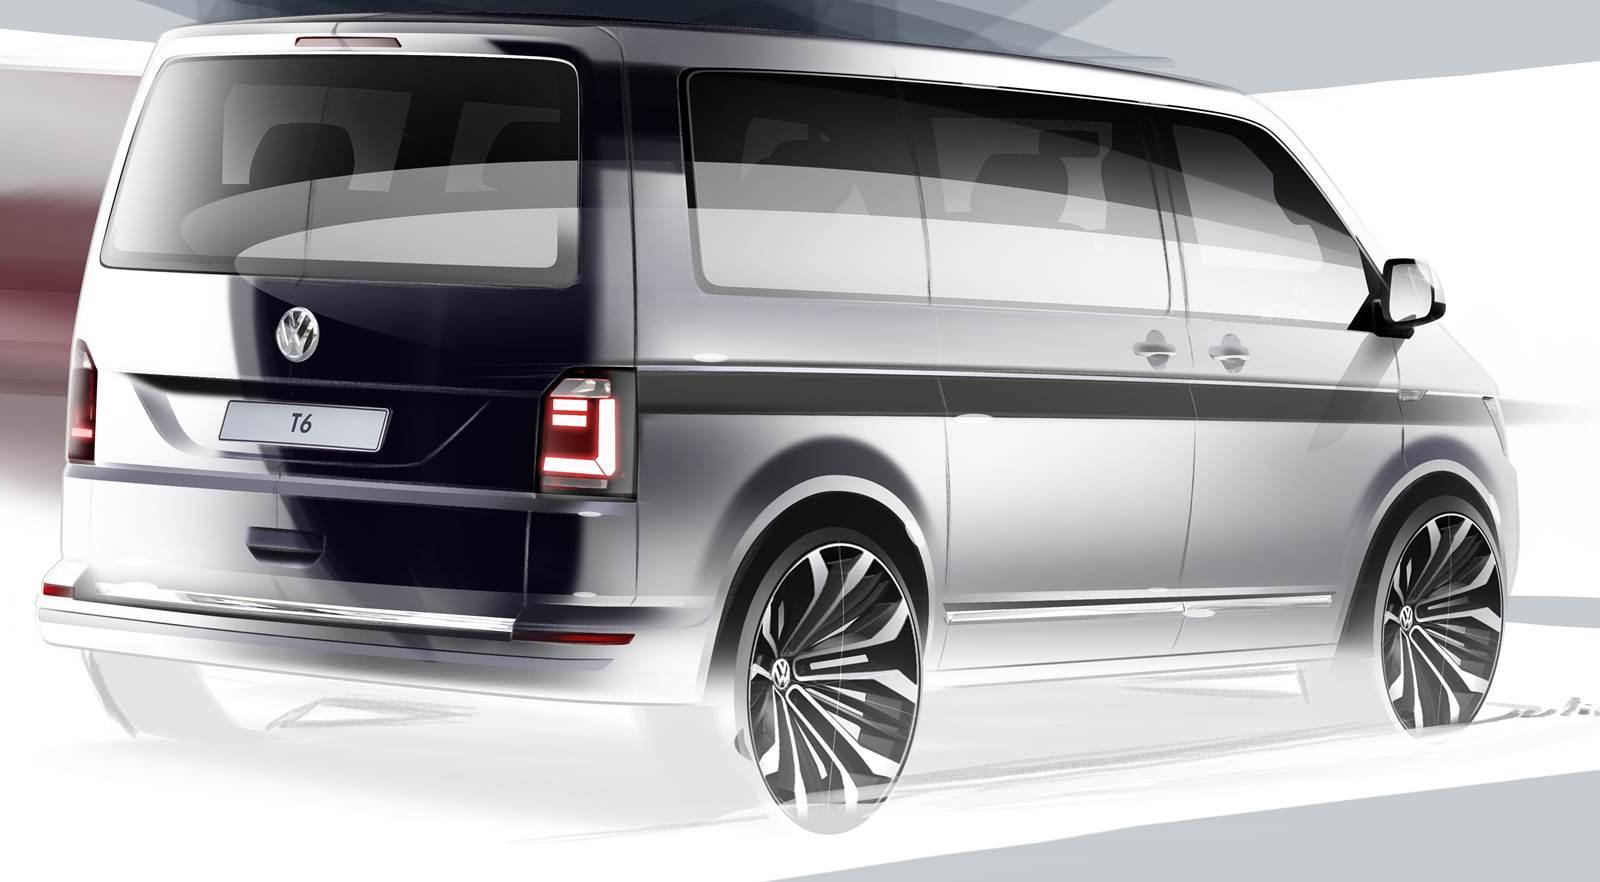 Volkswagen Transporter VI